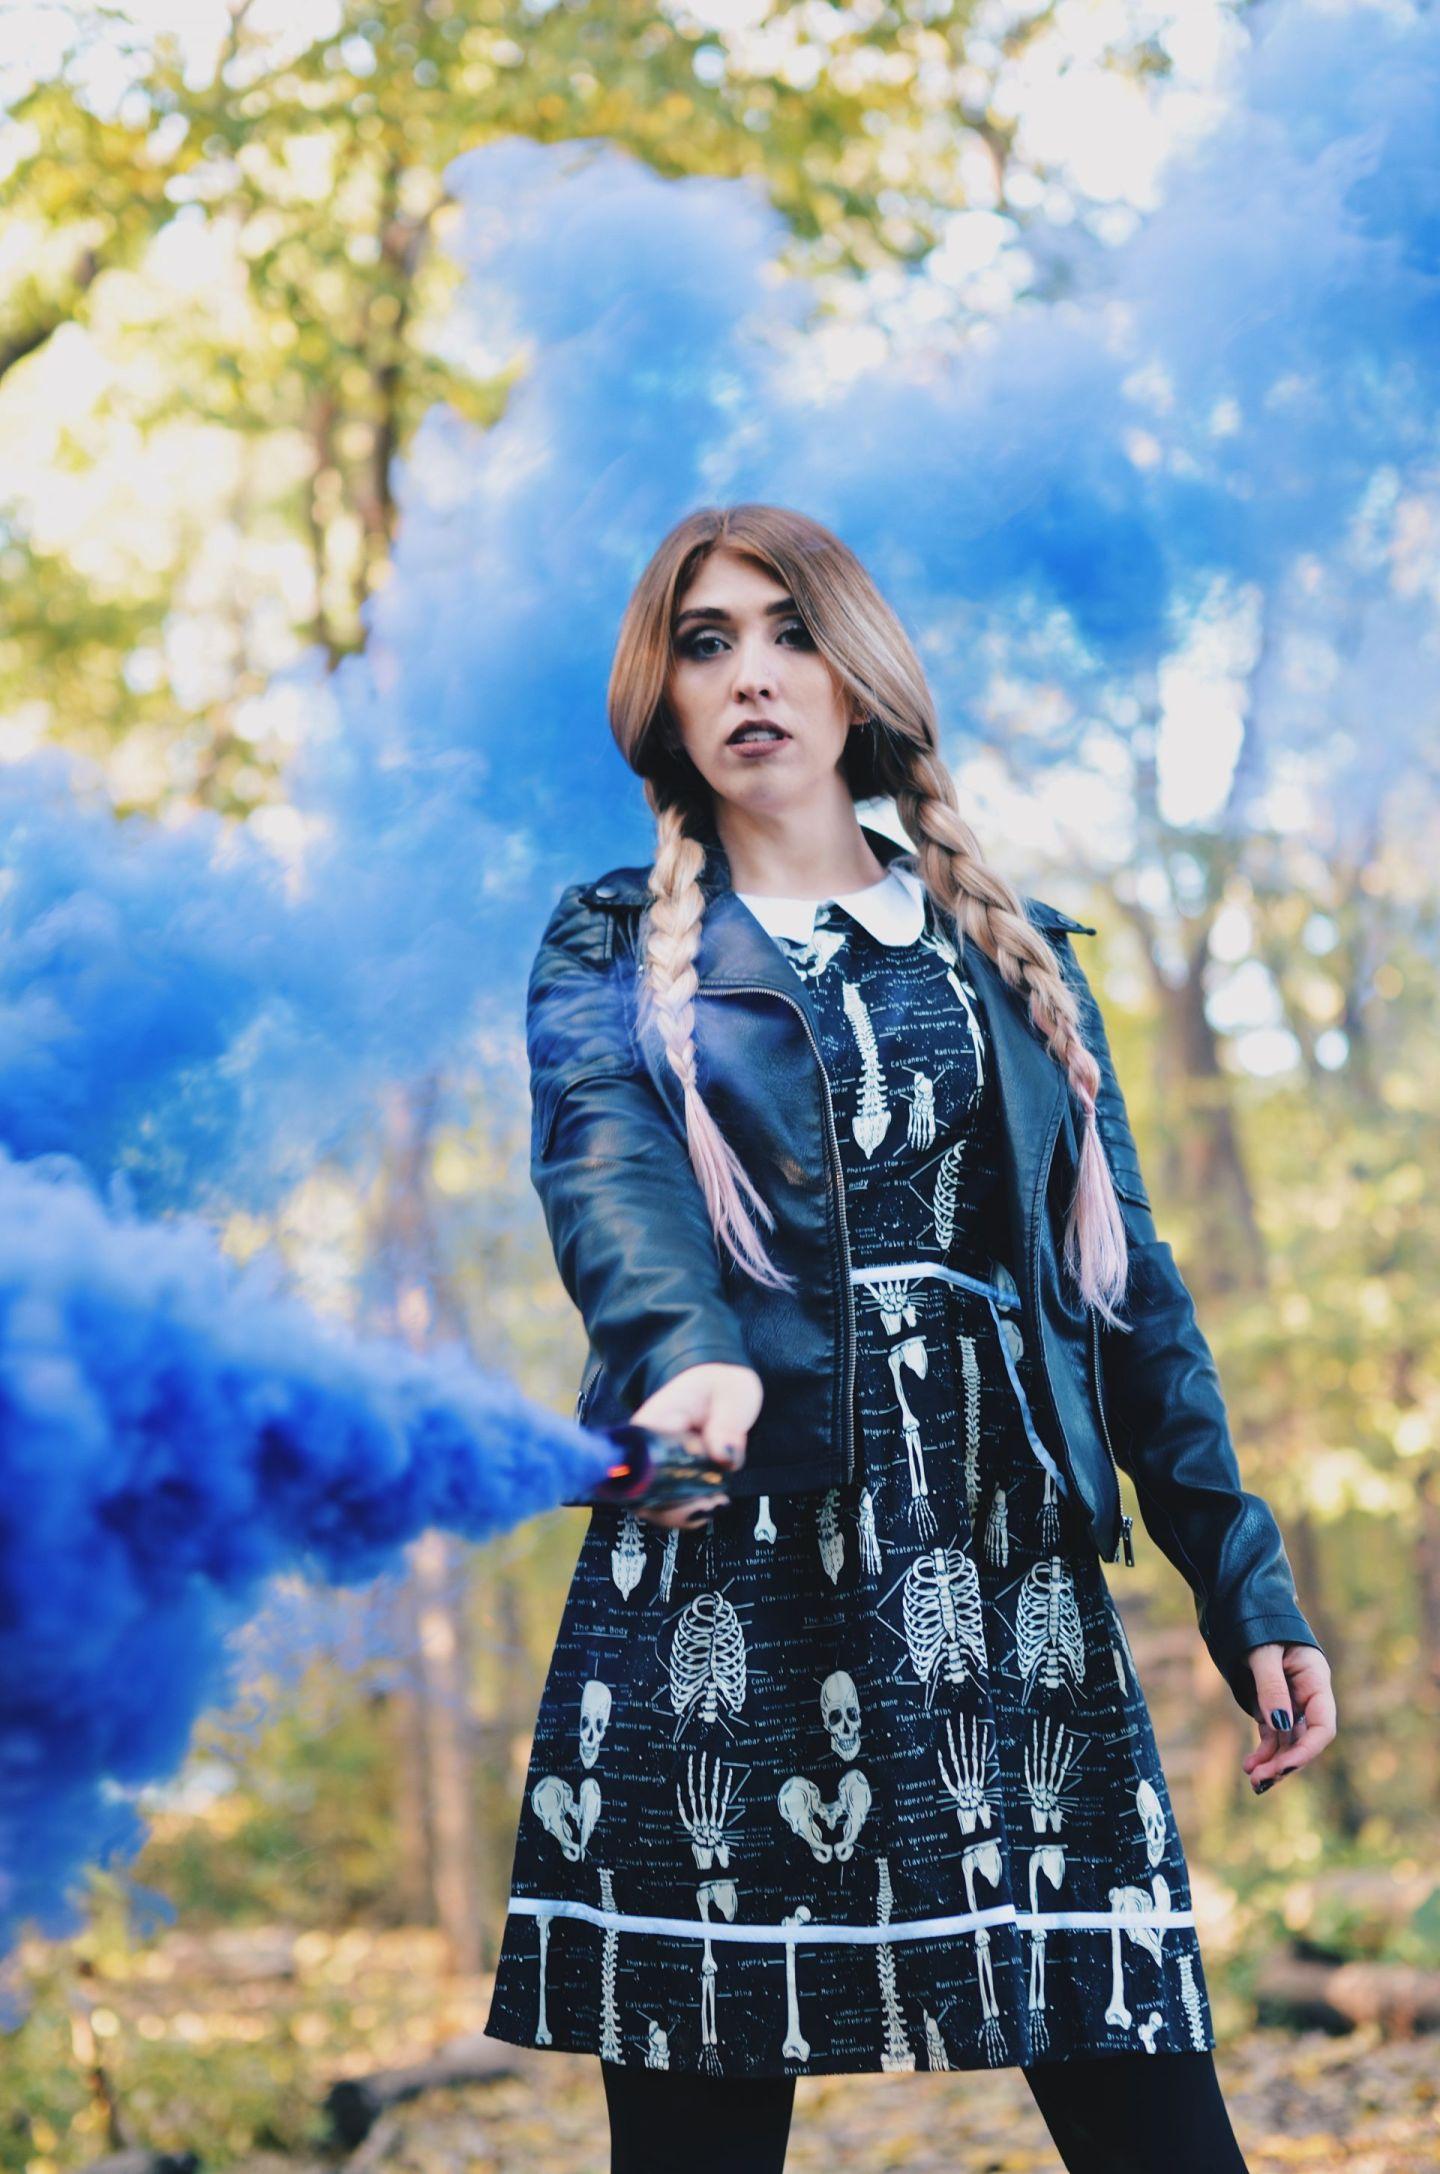 purple smoke bomb in skeleton dress